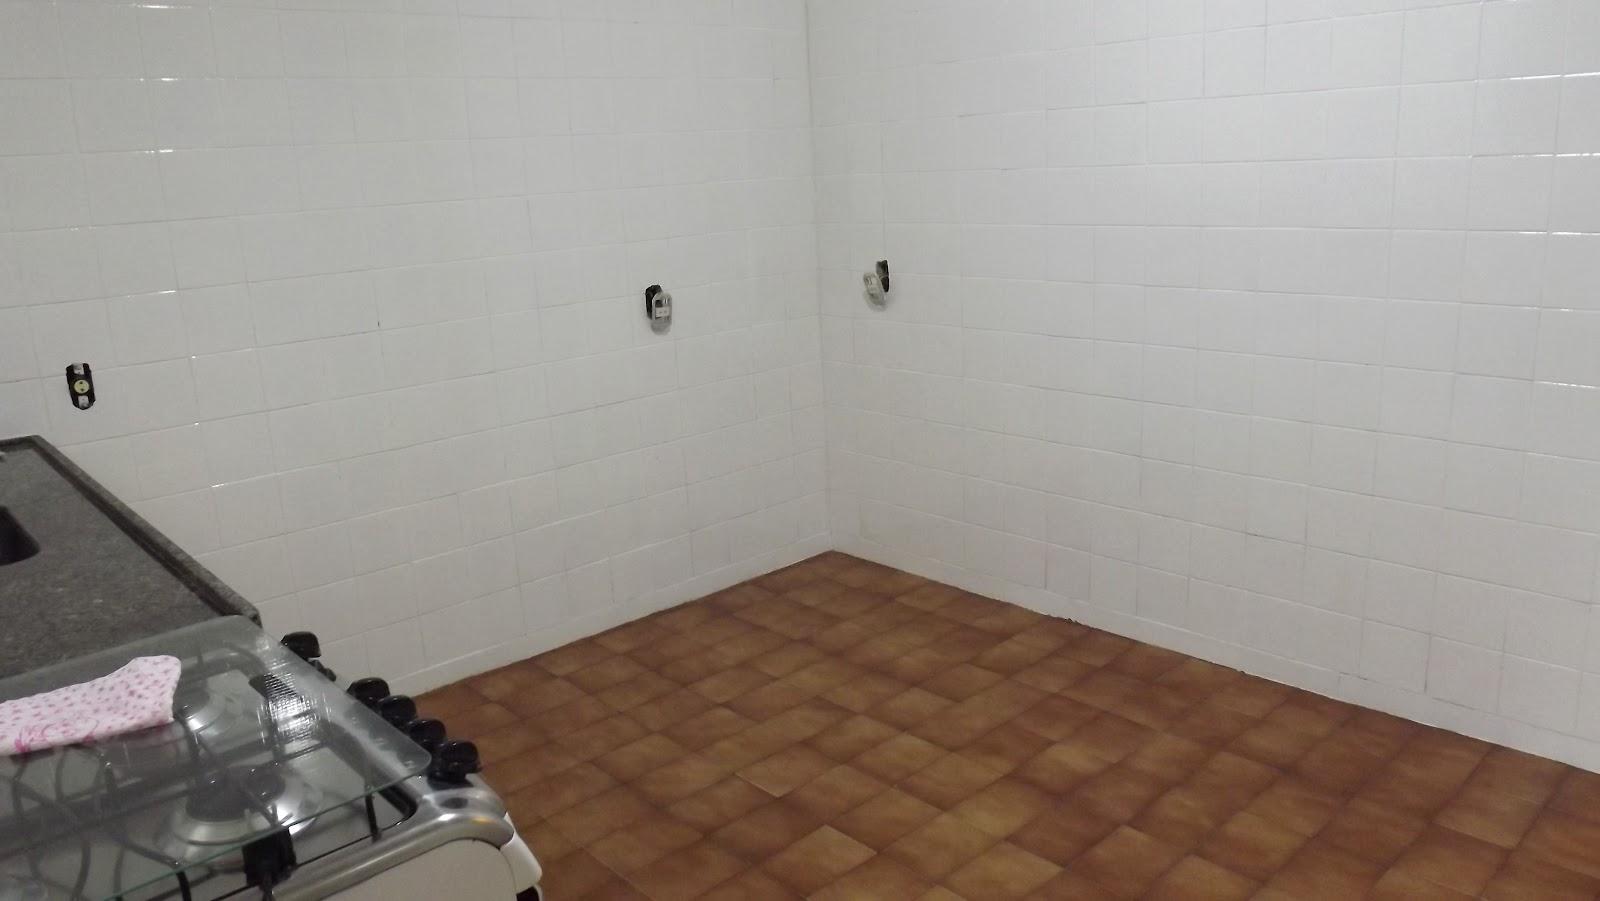 Renata Costa Arquiteta: Azulejo velho   tinta epóxi = cozinha nova #684631 1600x901 Banheiro Azulejo Ou Tinta